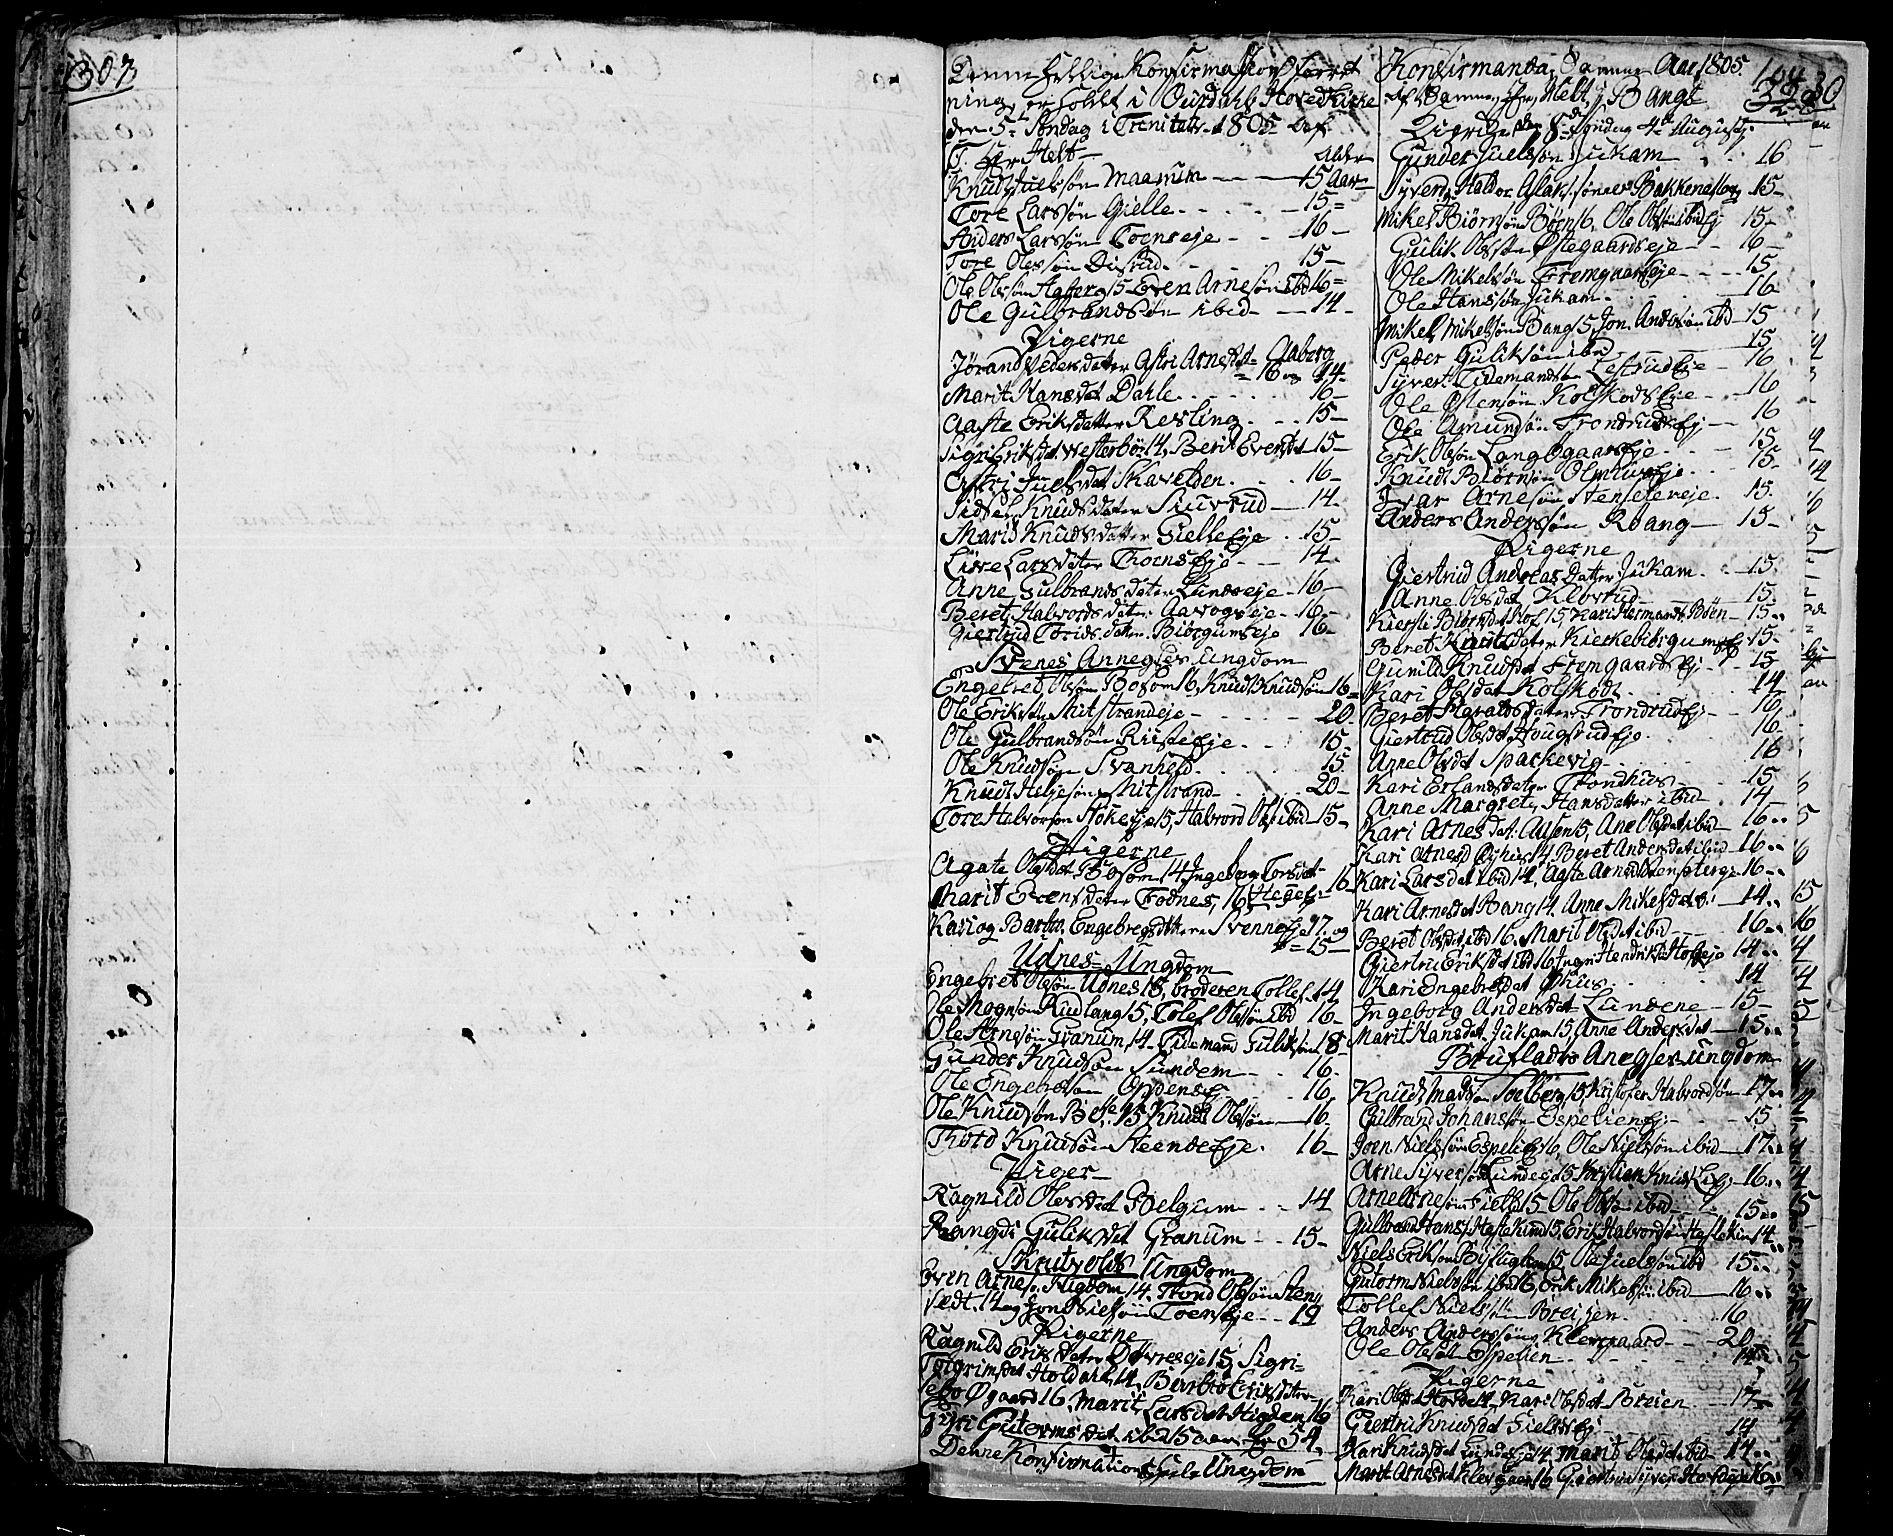 SAH, Aurdal prestekontor, Ministerialbok nr. 7, 1800-1808, s. 104